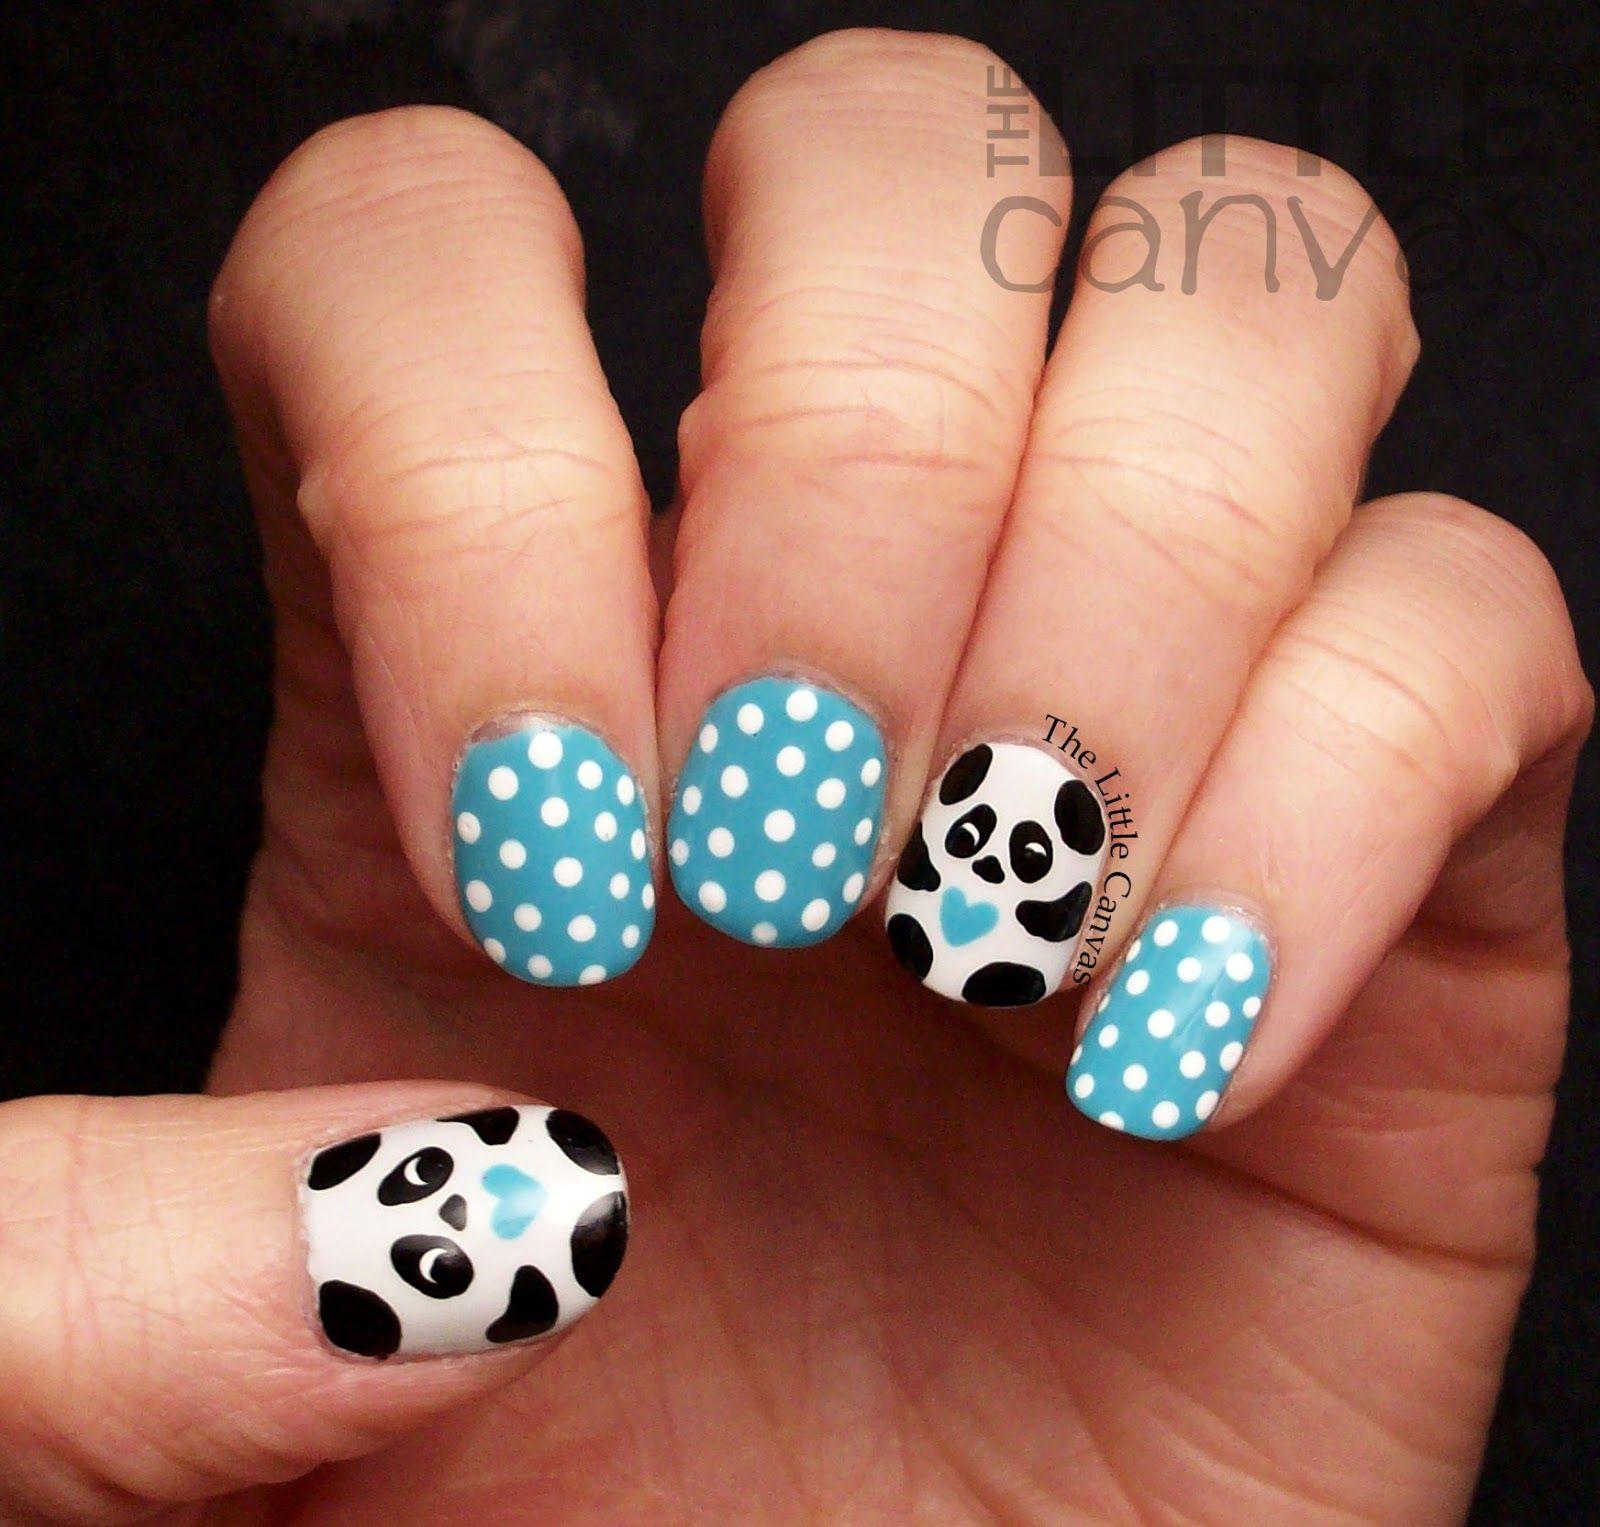 The Little Canvas Panda Nail Art